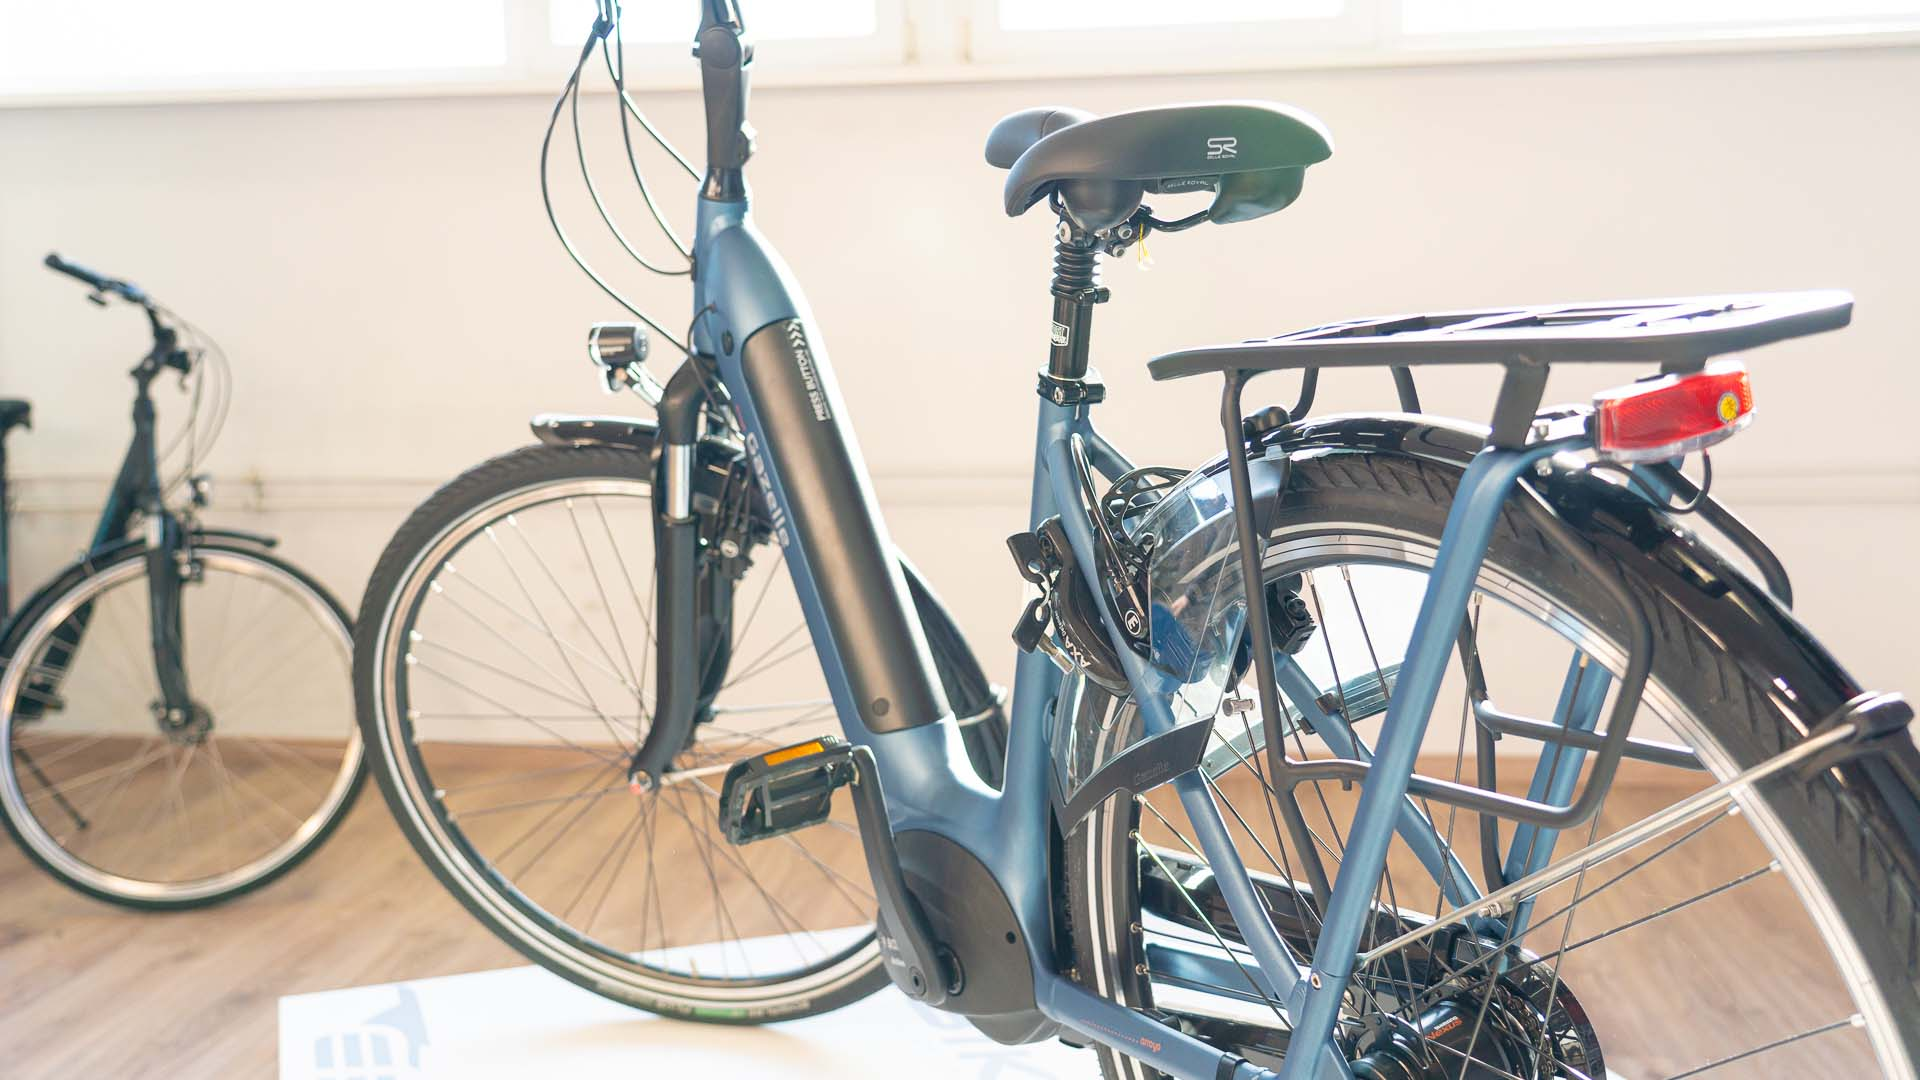 Fahrradzentrum Grauthoff Fotoshooting 5